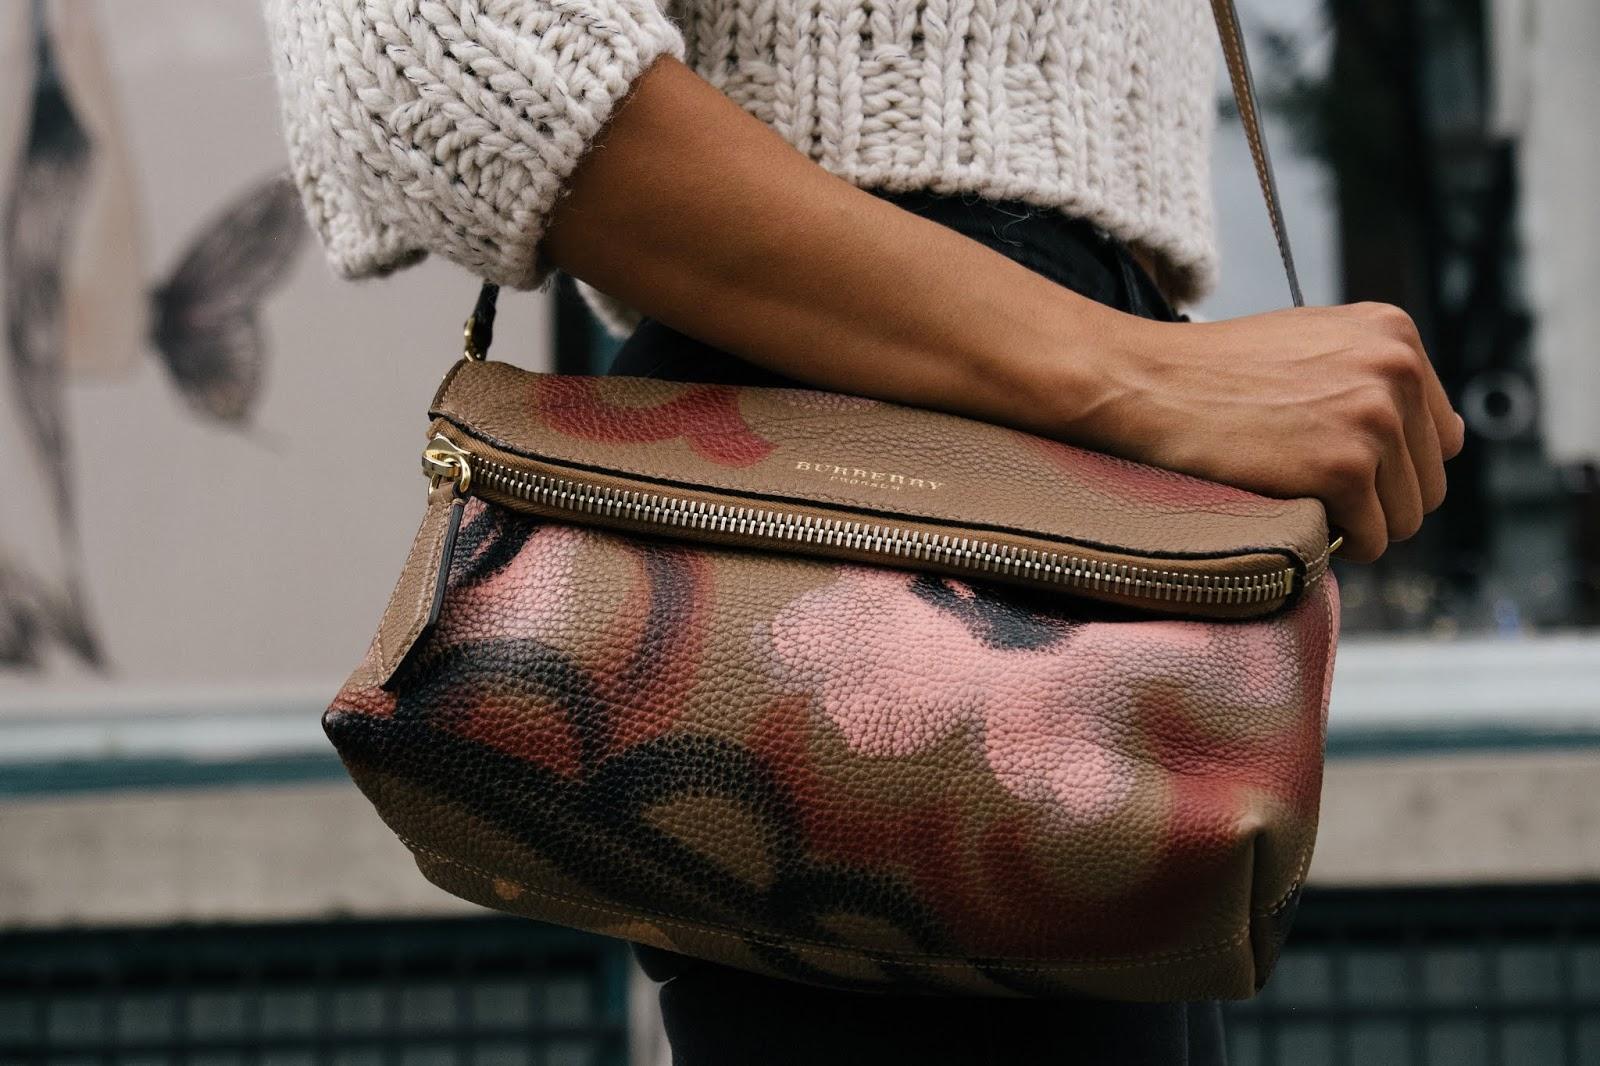 crossbody burberry handbag professional photo street style